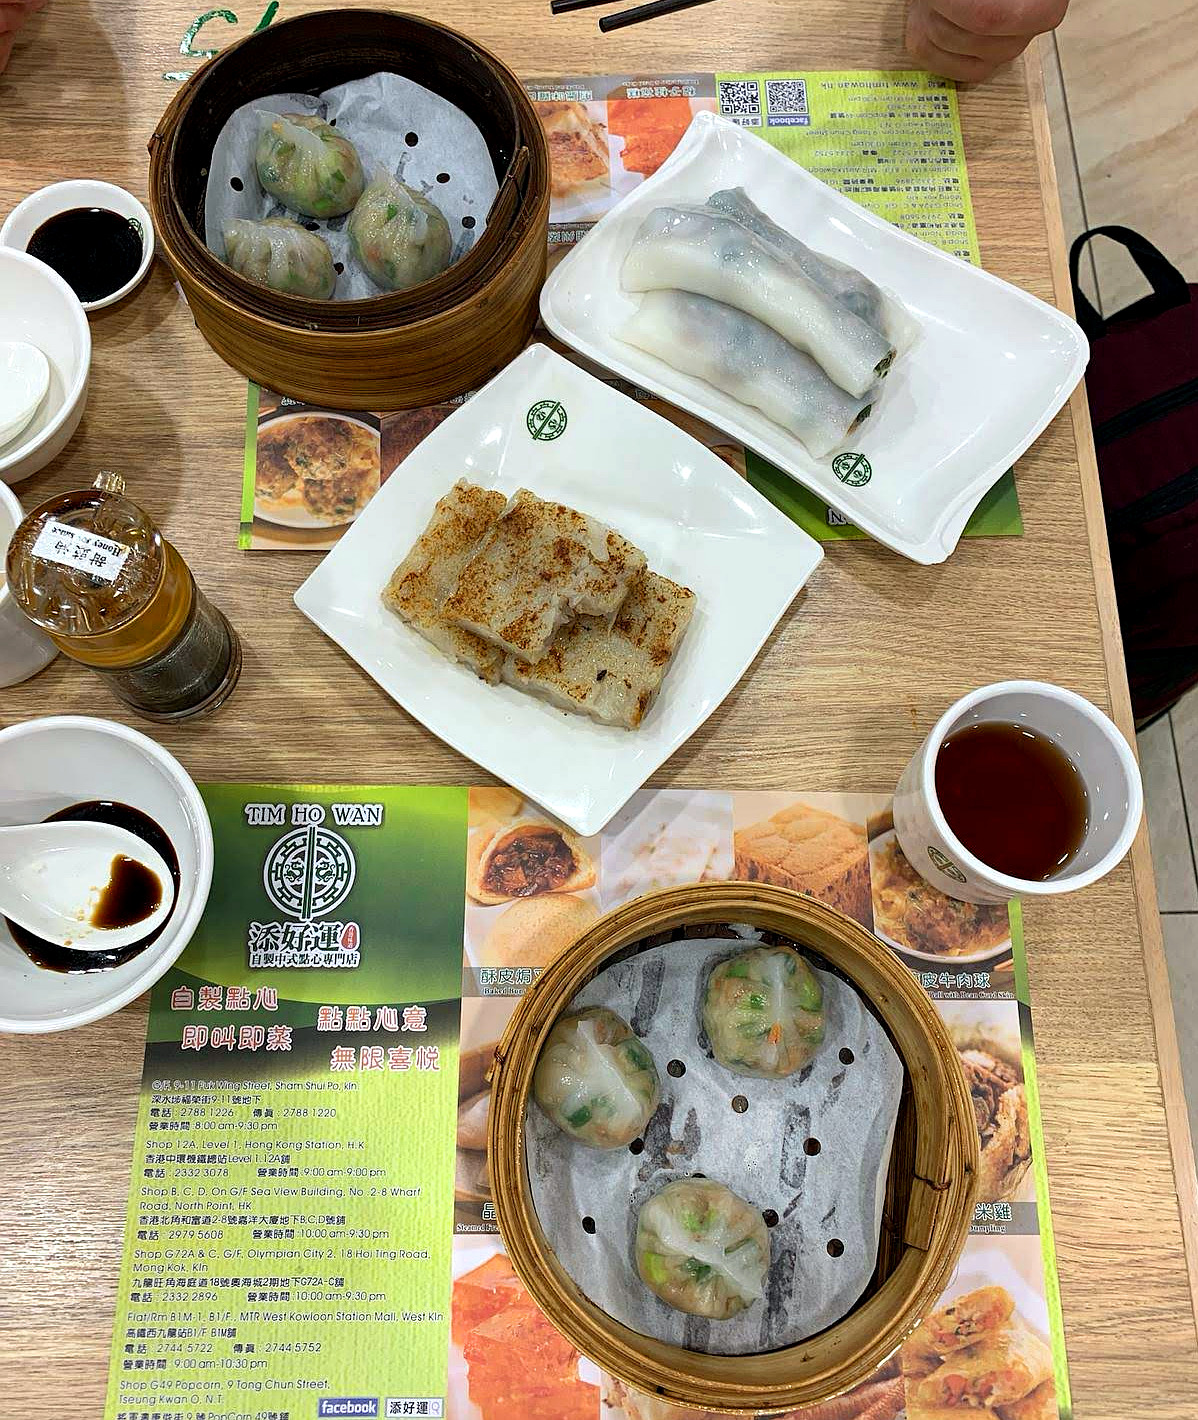 Dim Sum bei Tom Ho Wan